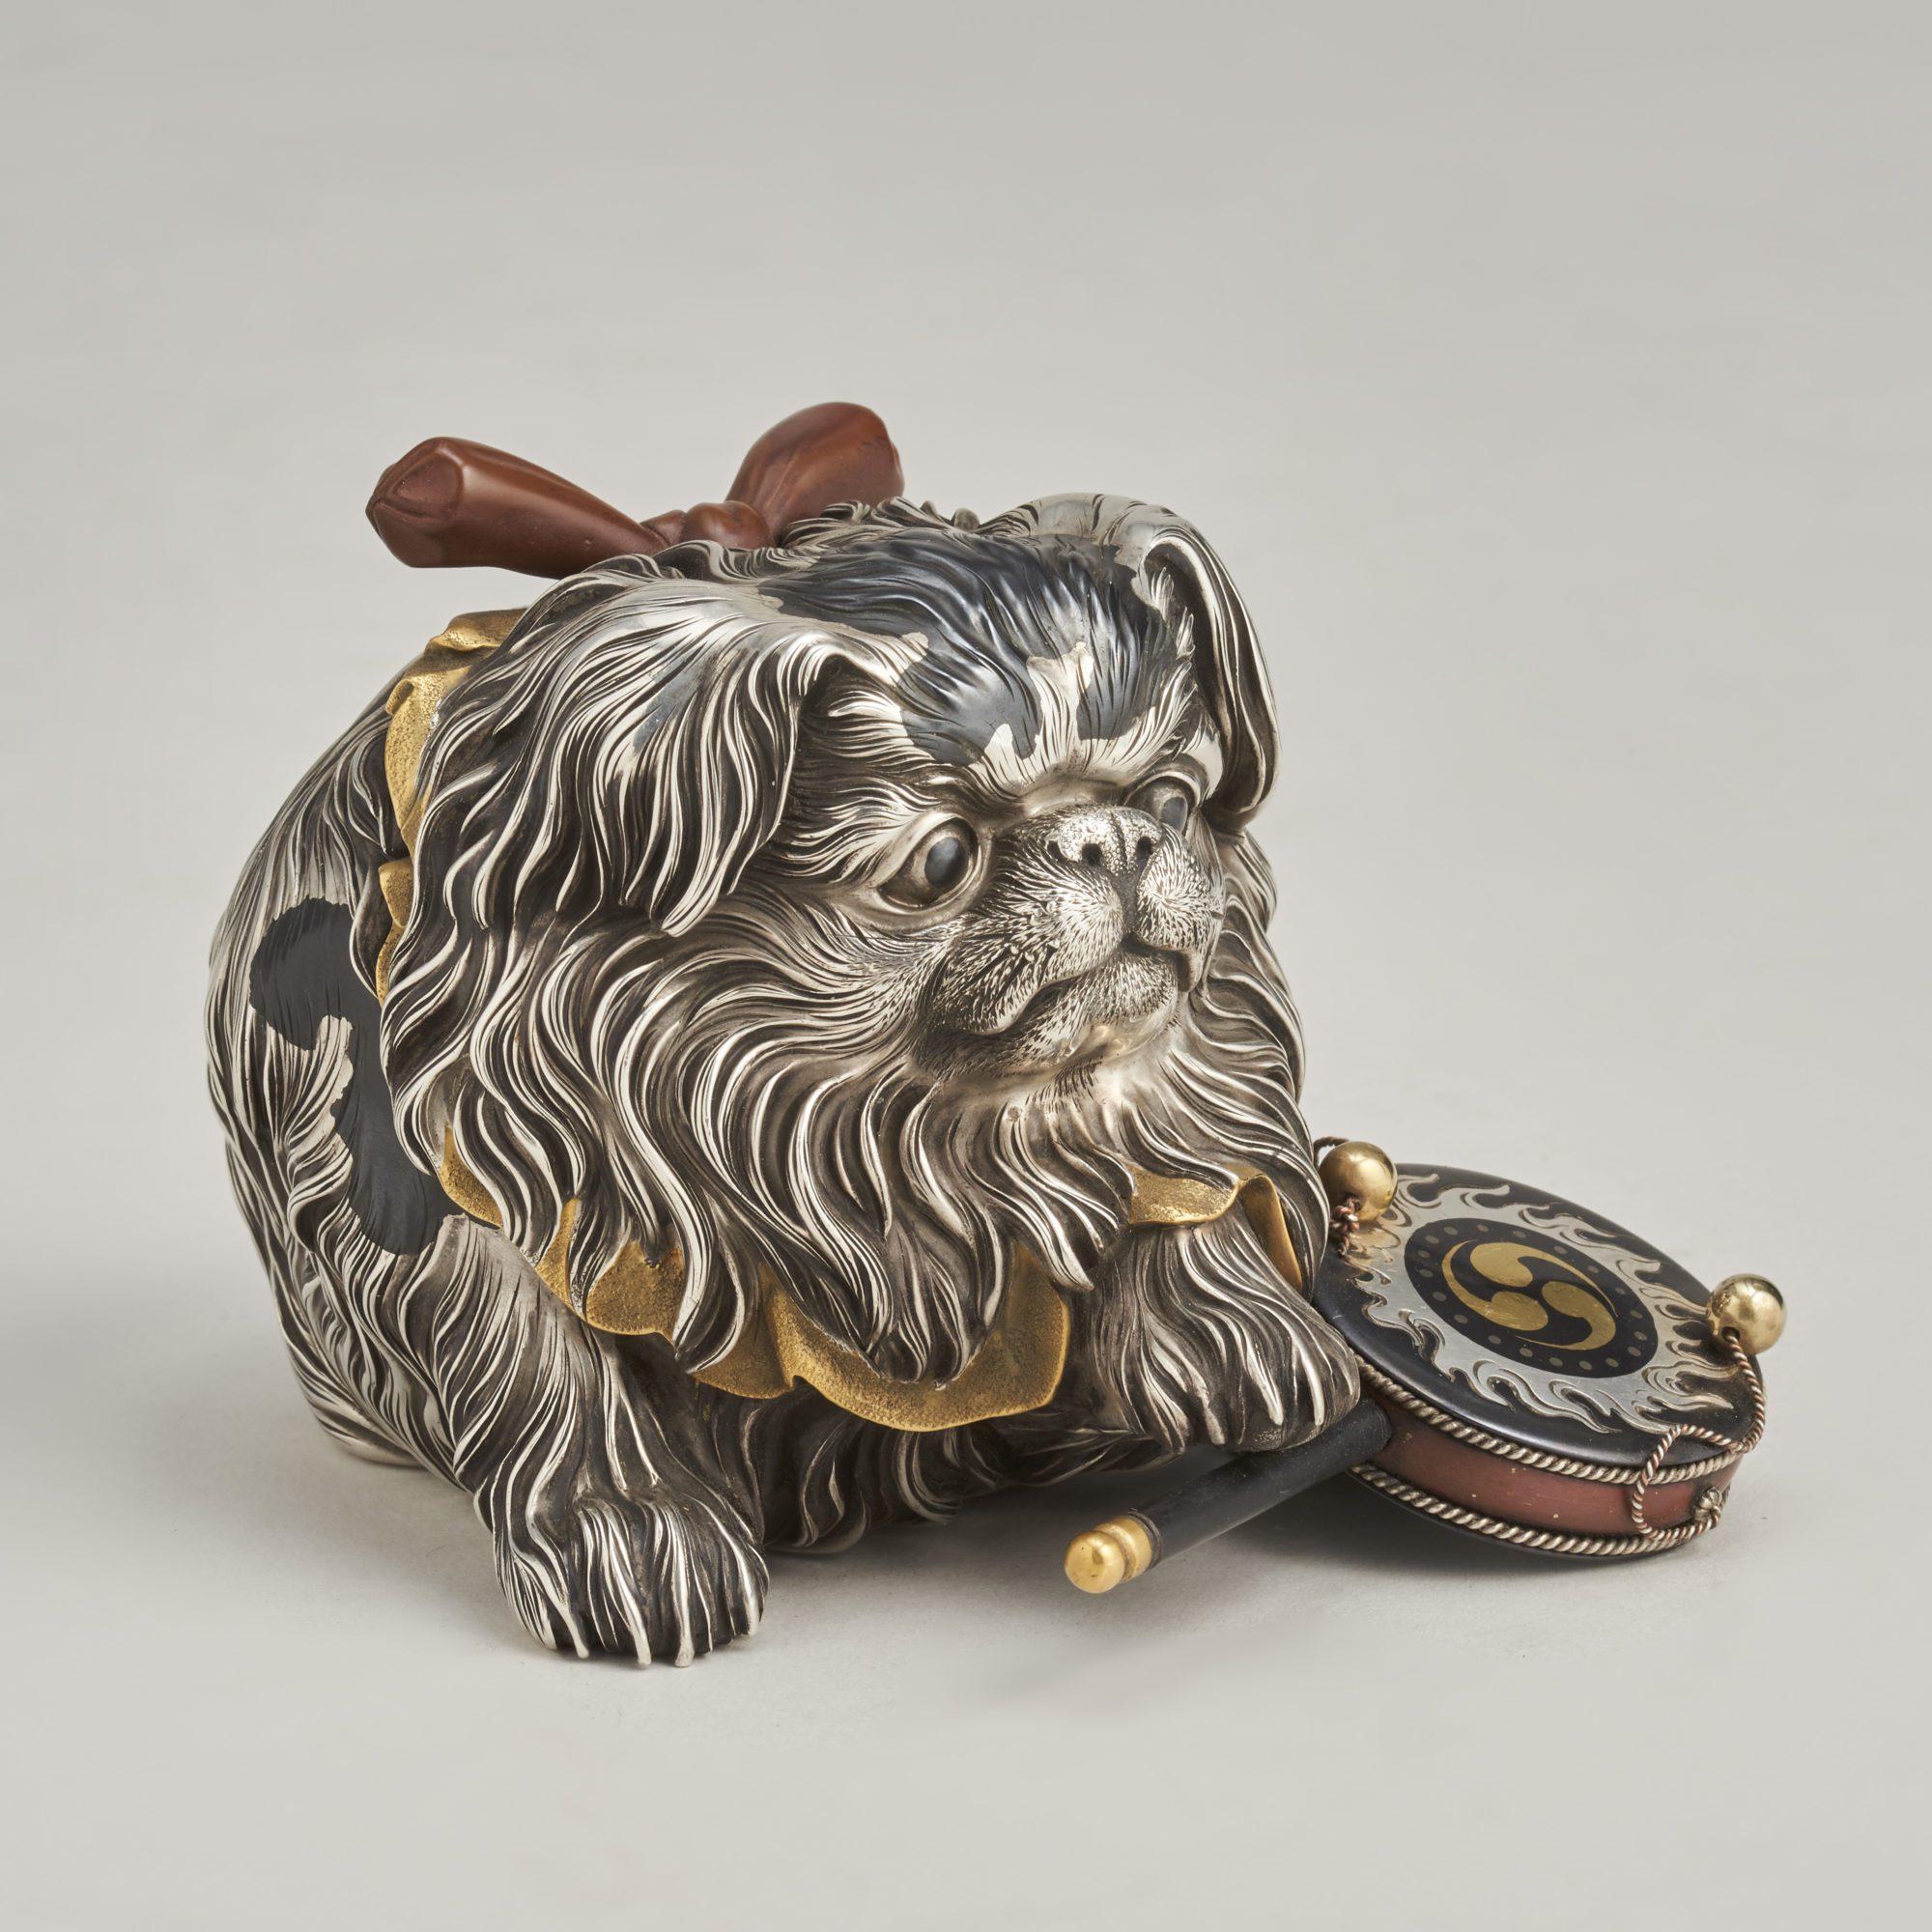 Jomi Okimono   An exceptional Japanese, Meiji-era Silver Okimono of a puppy by Jomi